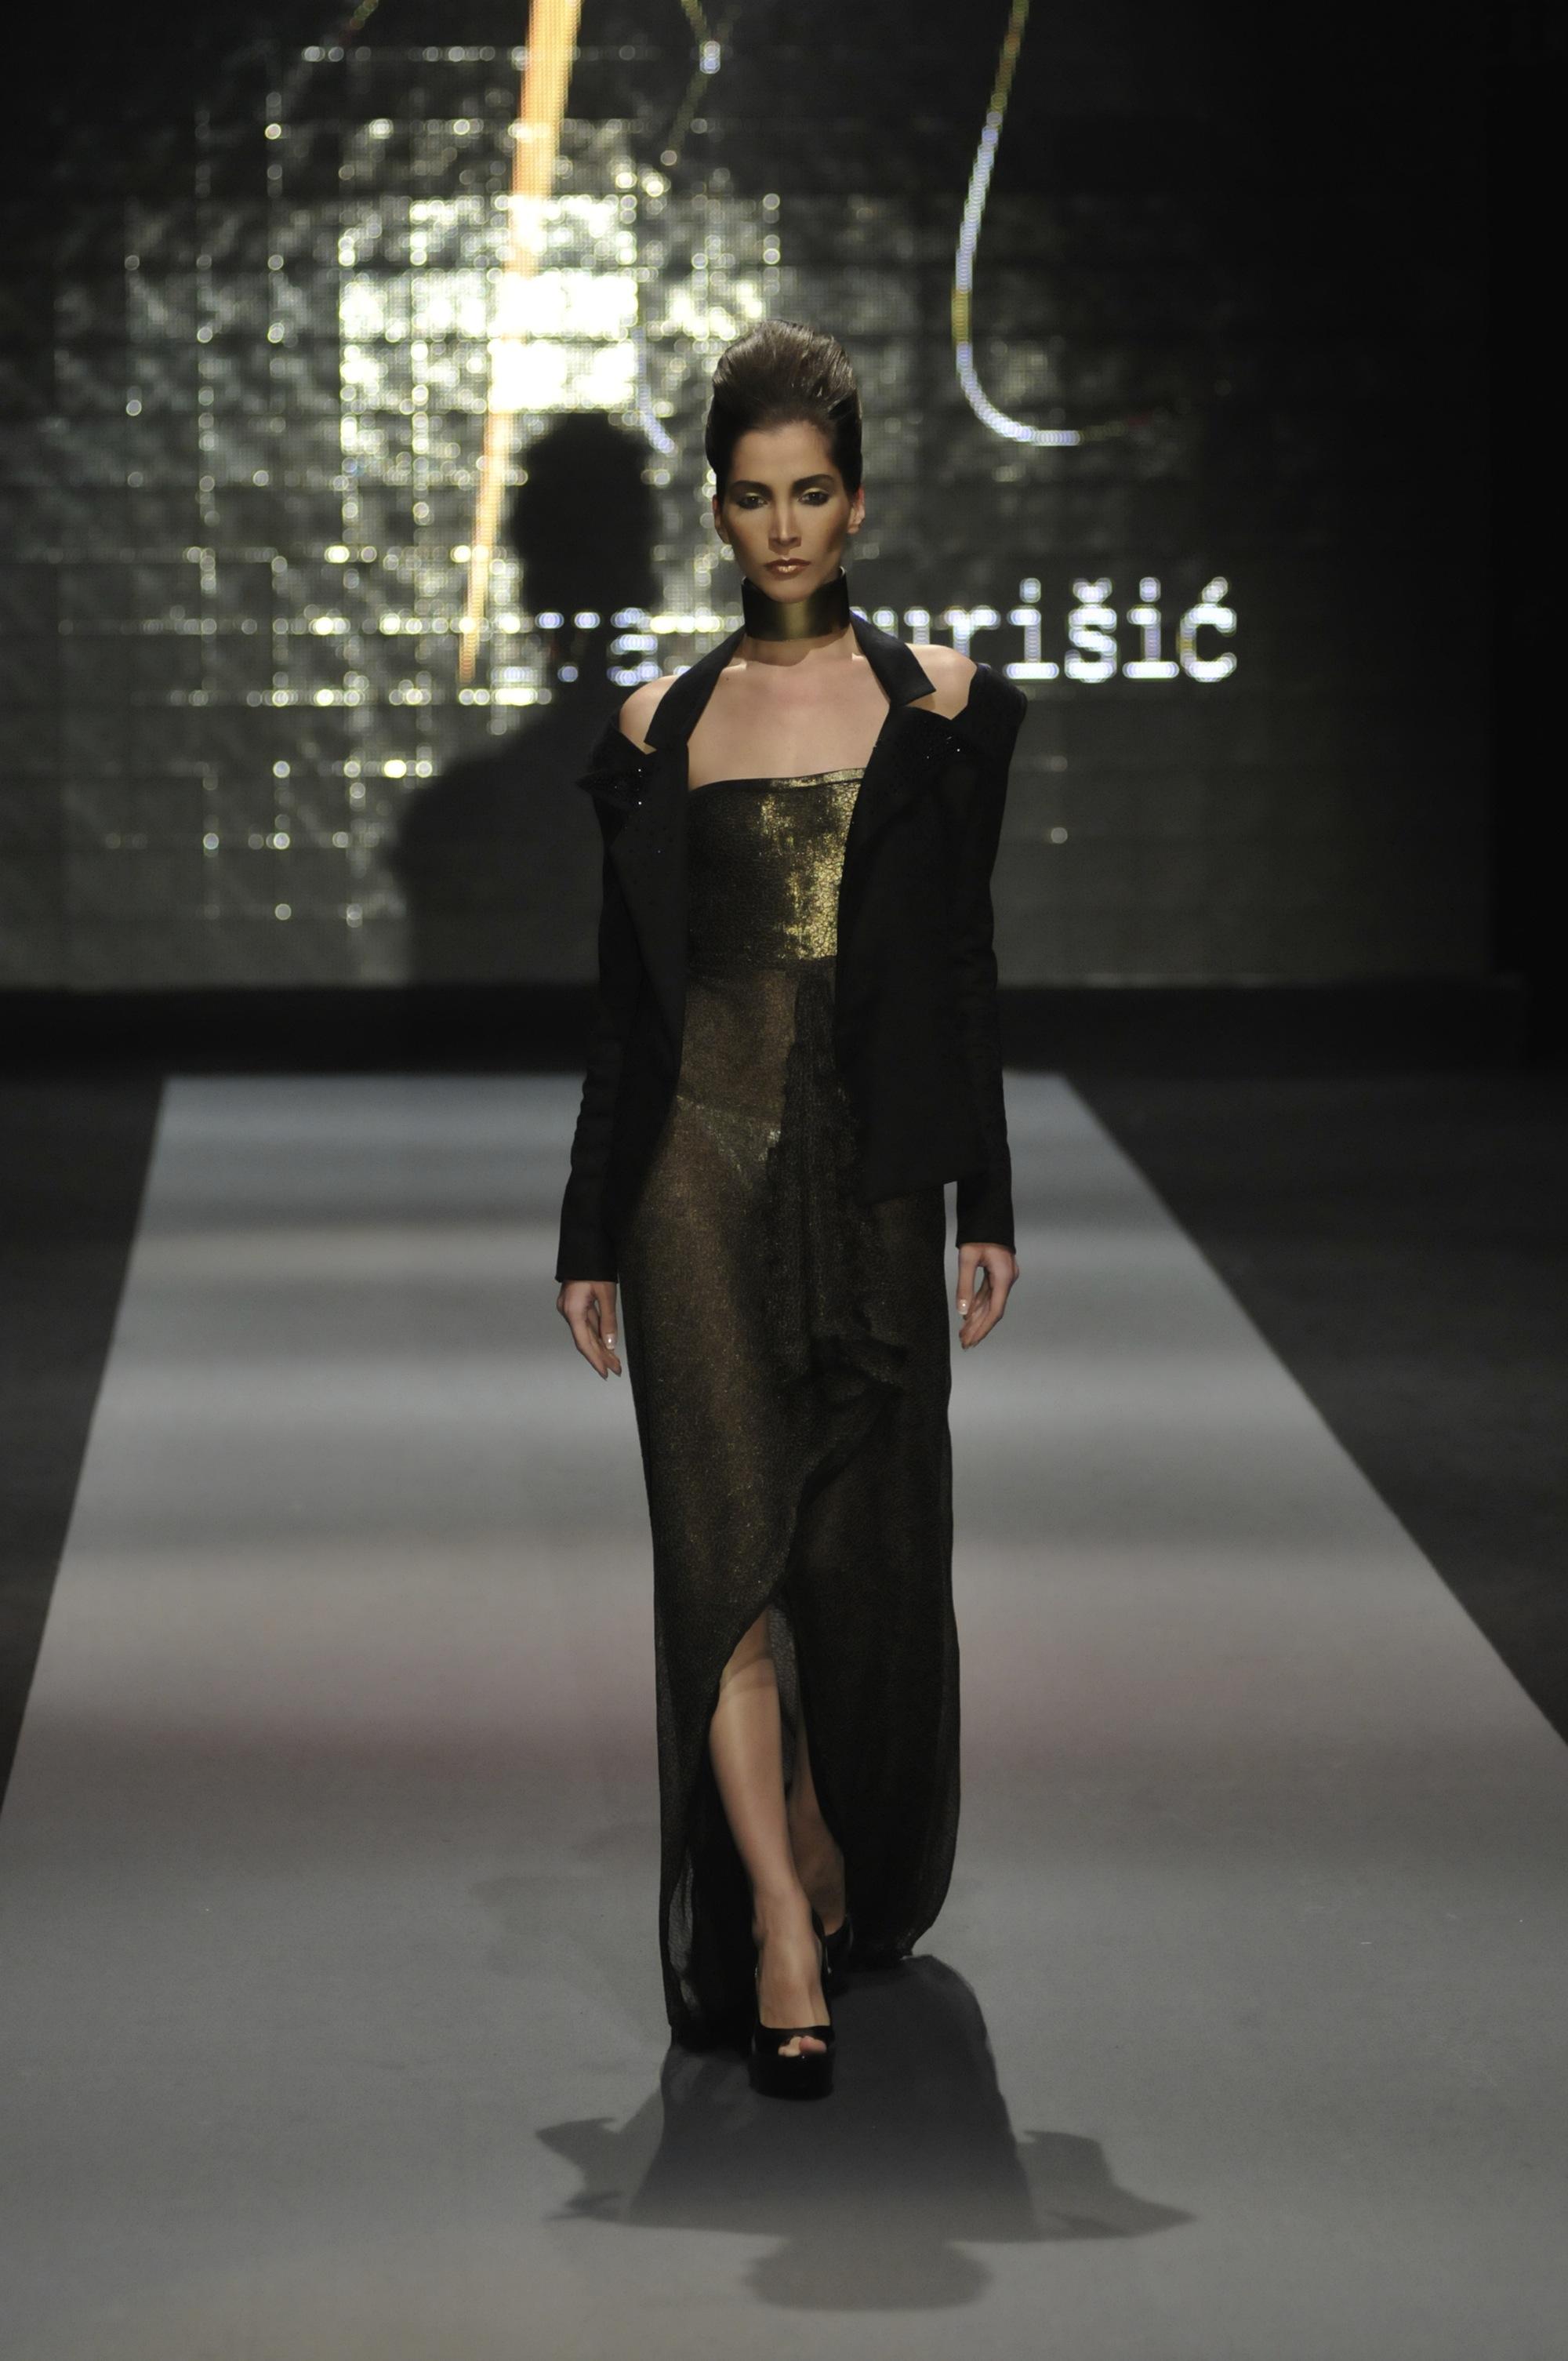 ivanamurisic Peto veče 30.Amstel Fashion Week a